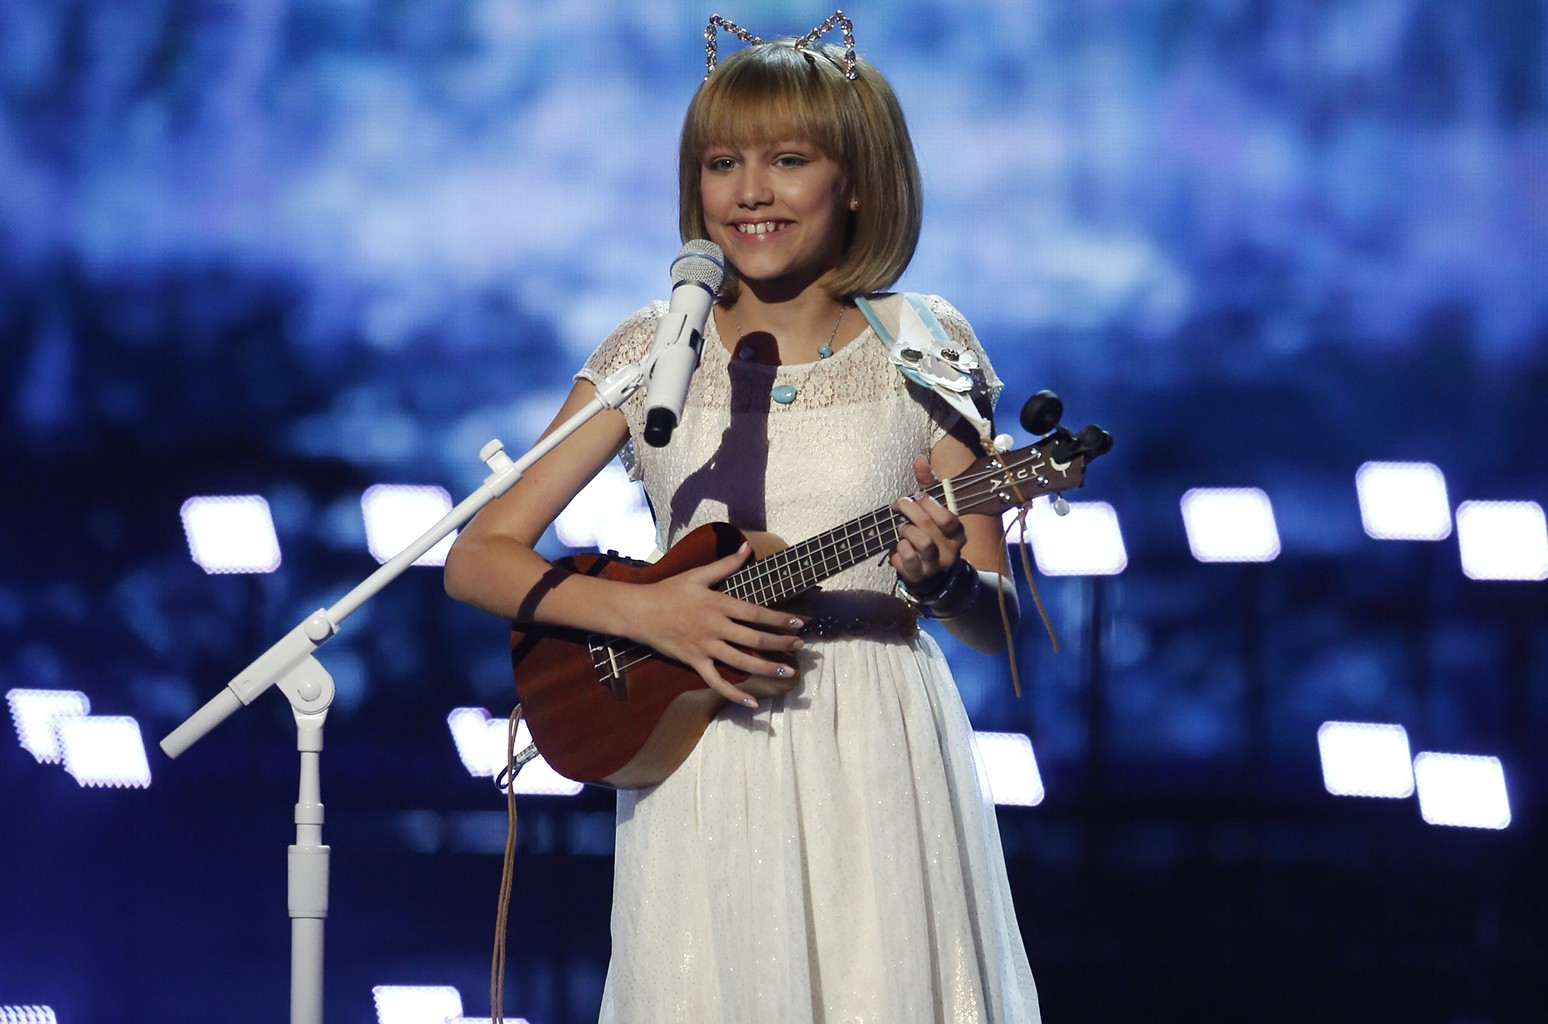 Grace VanderWaal on America's Got Talent.